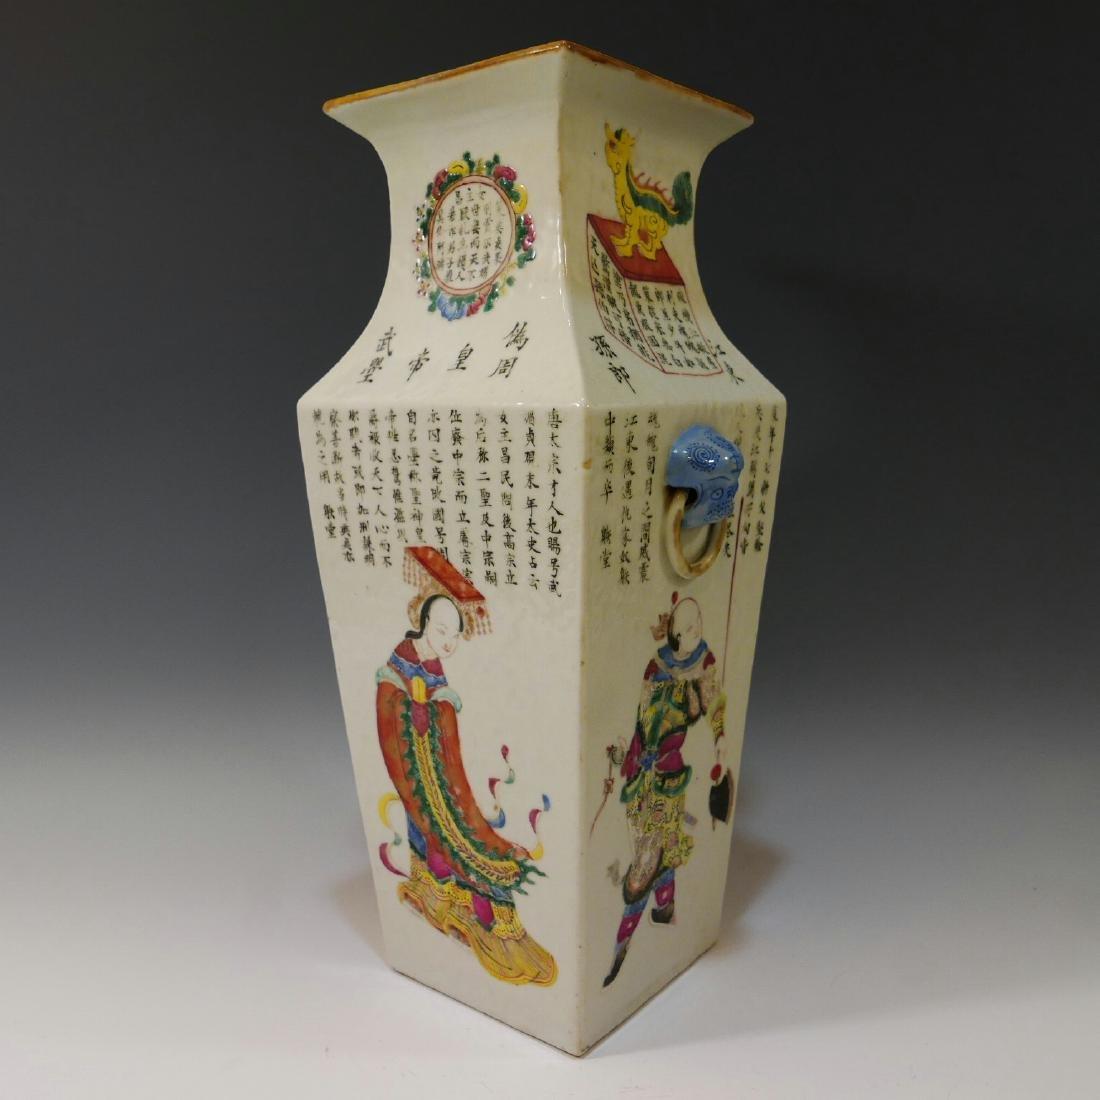 CHINESE ANTIQUE FAMILLE ROSE WUSHUANGPU VASE - 19TH